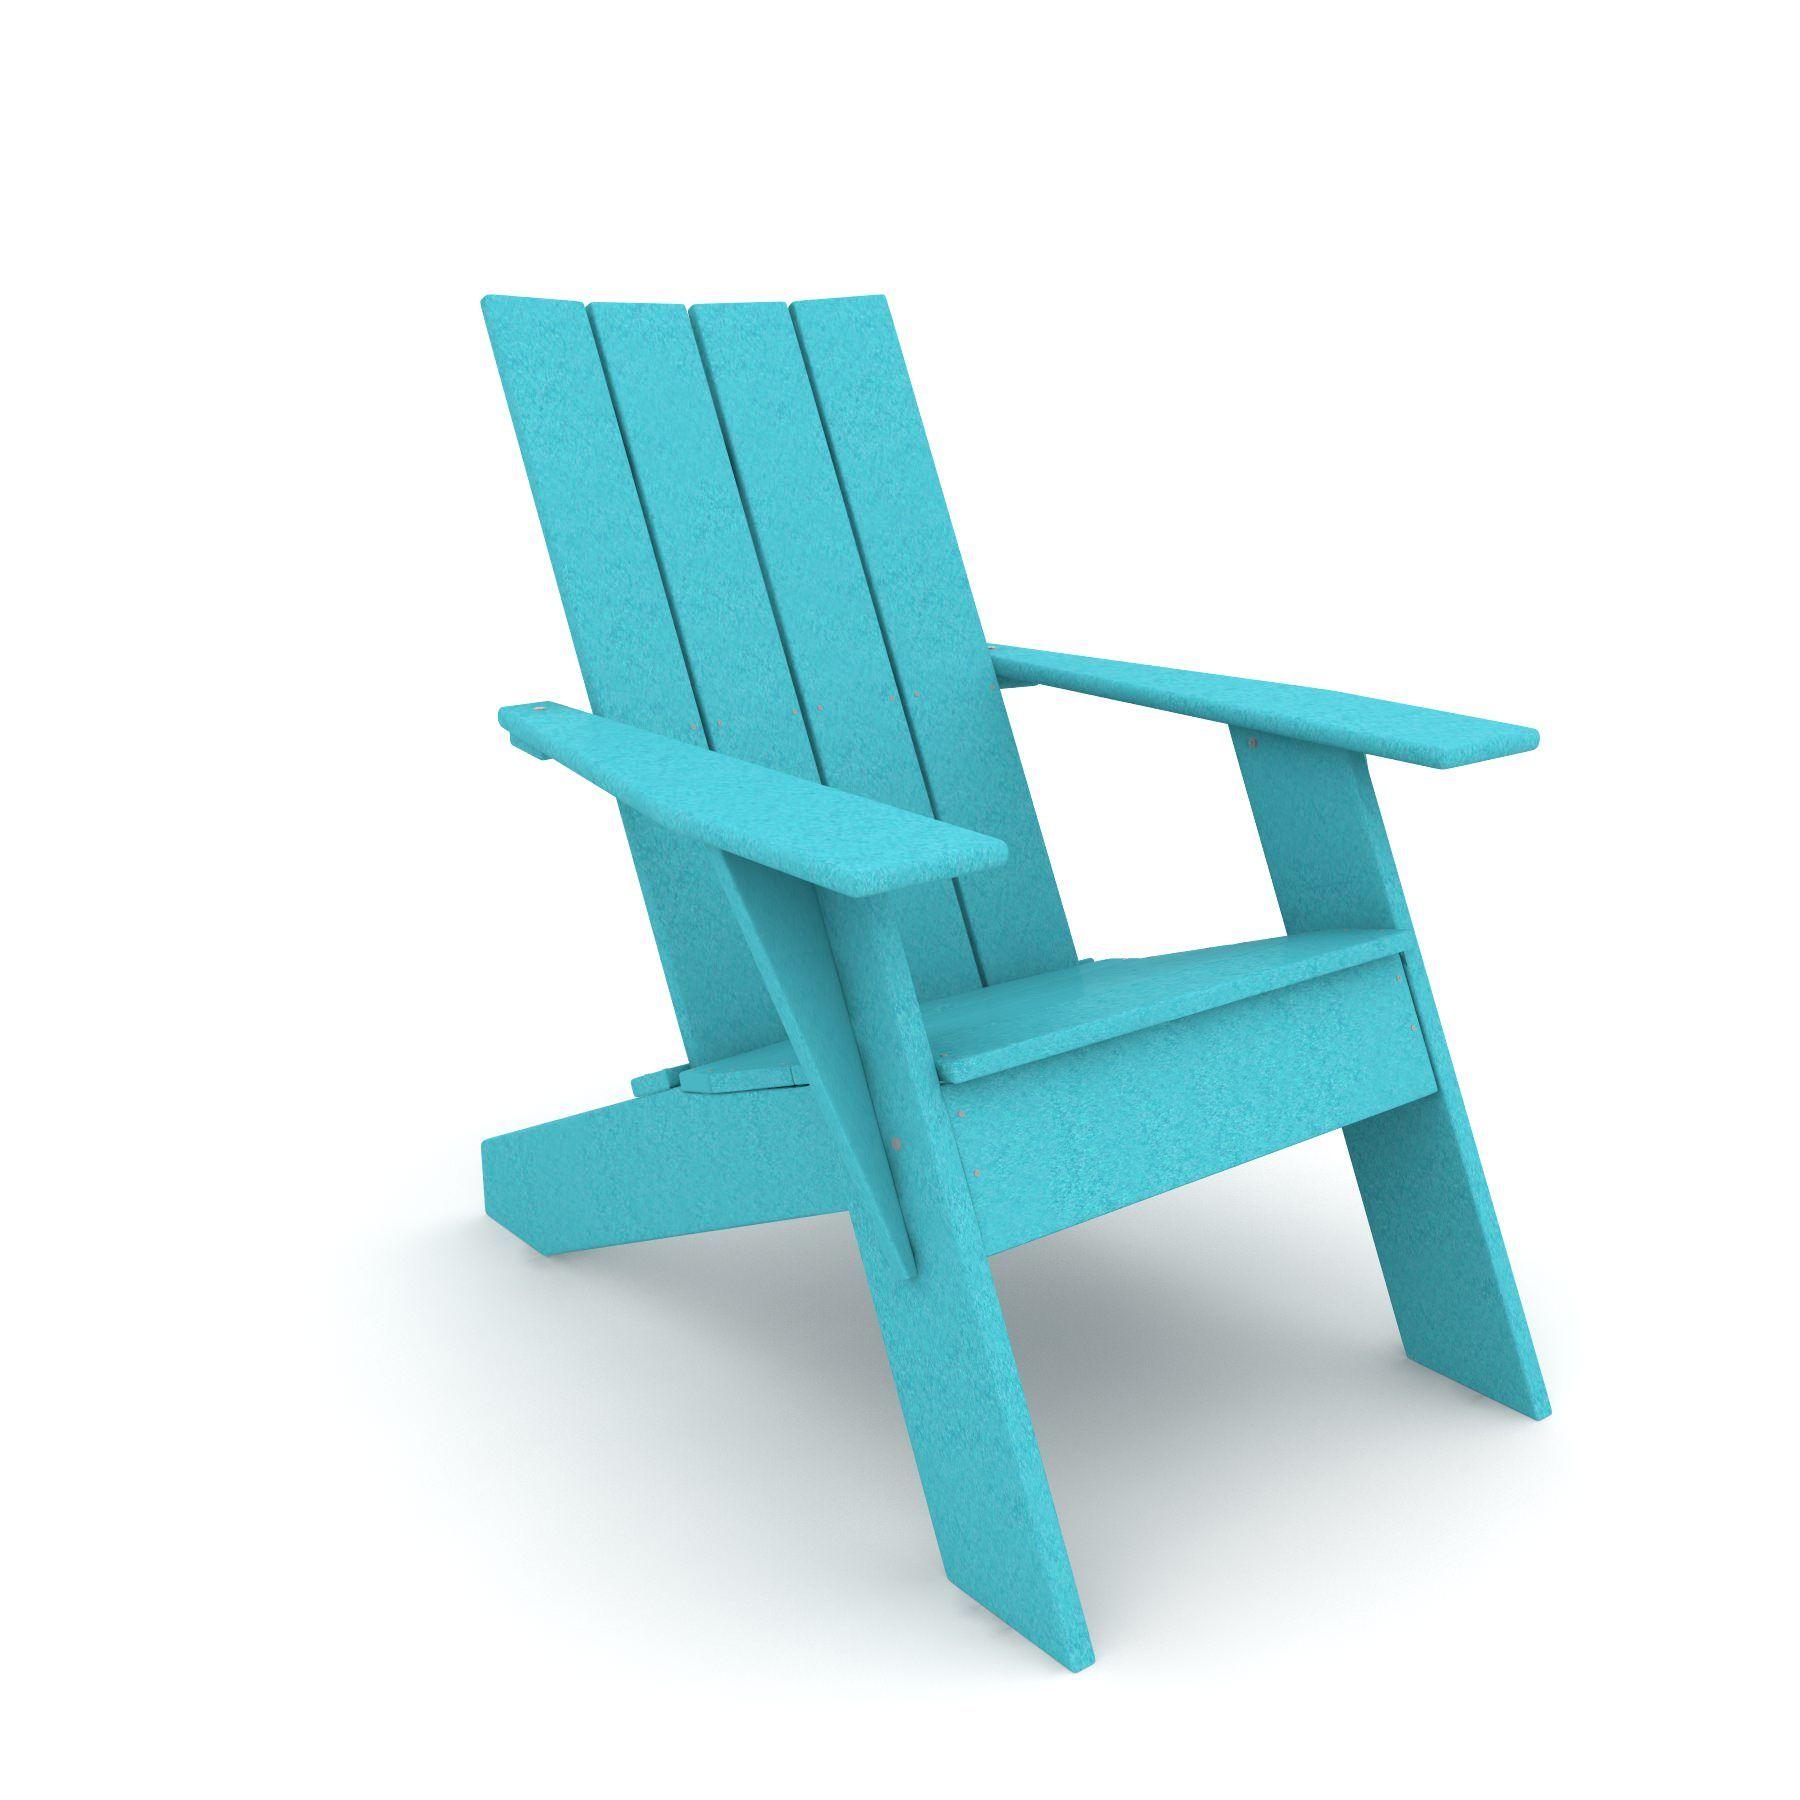 Türkis Adirondack Stühle | Stühle modern | Pinterest